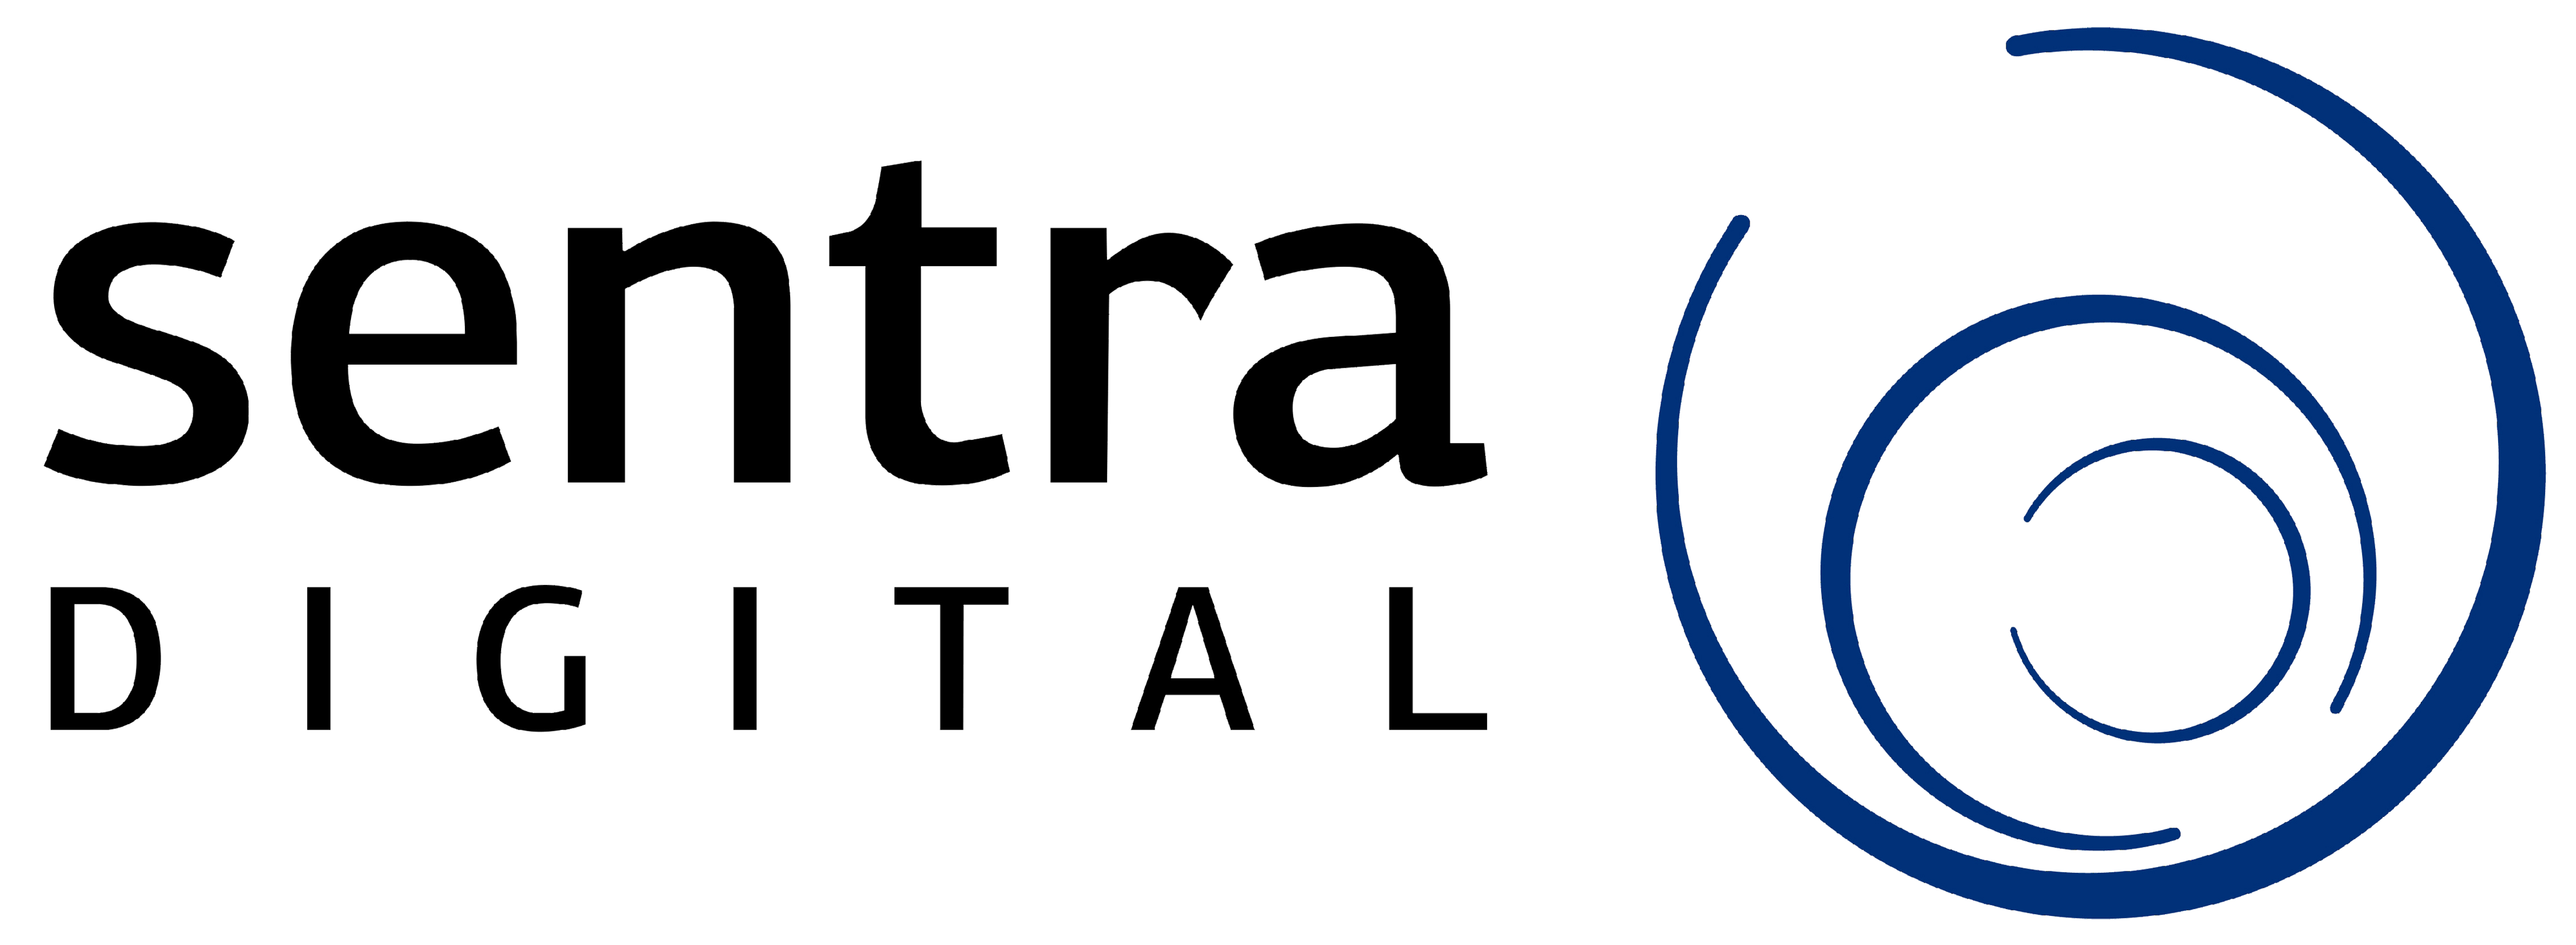 Jual Produk Merchant Sentra Digital Terbaru November 2018 Sony Alpha A5100 Kit 16 50mm Hitam